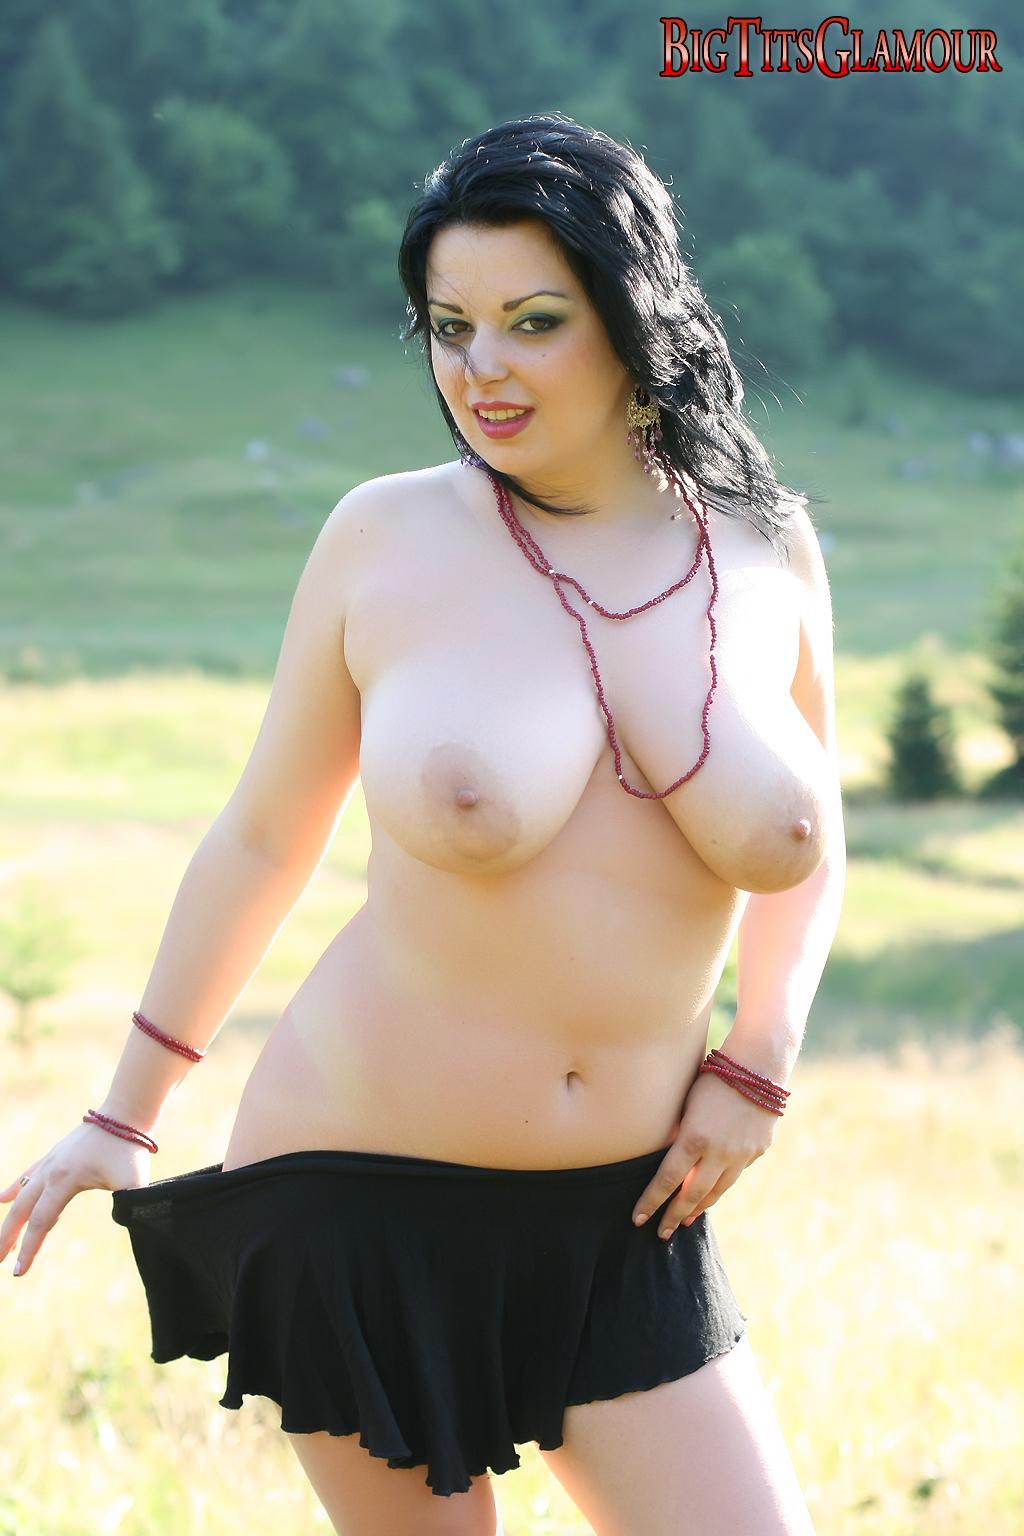 Big tits and mini skirts